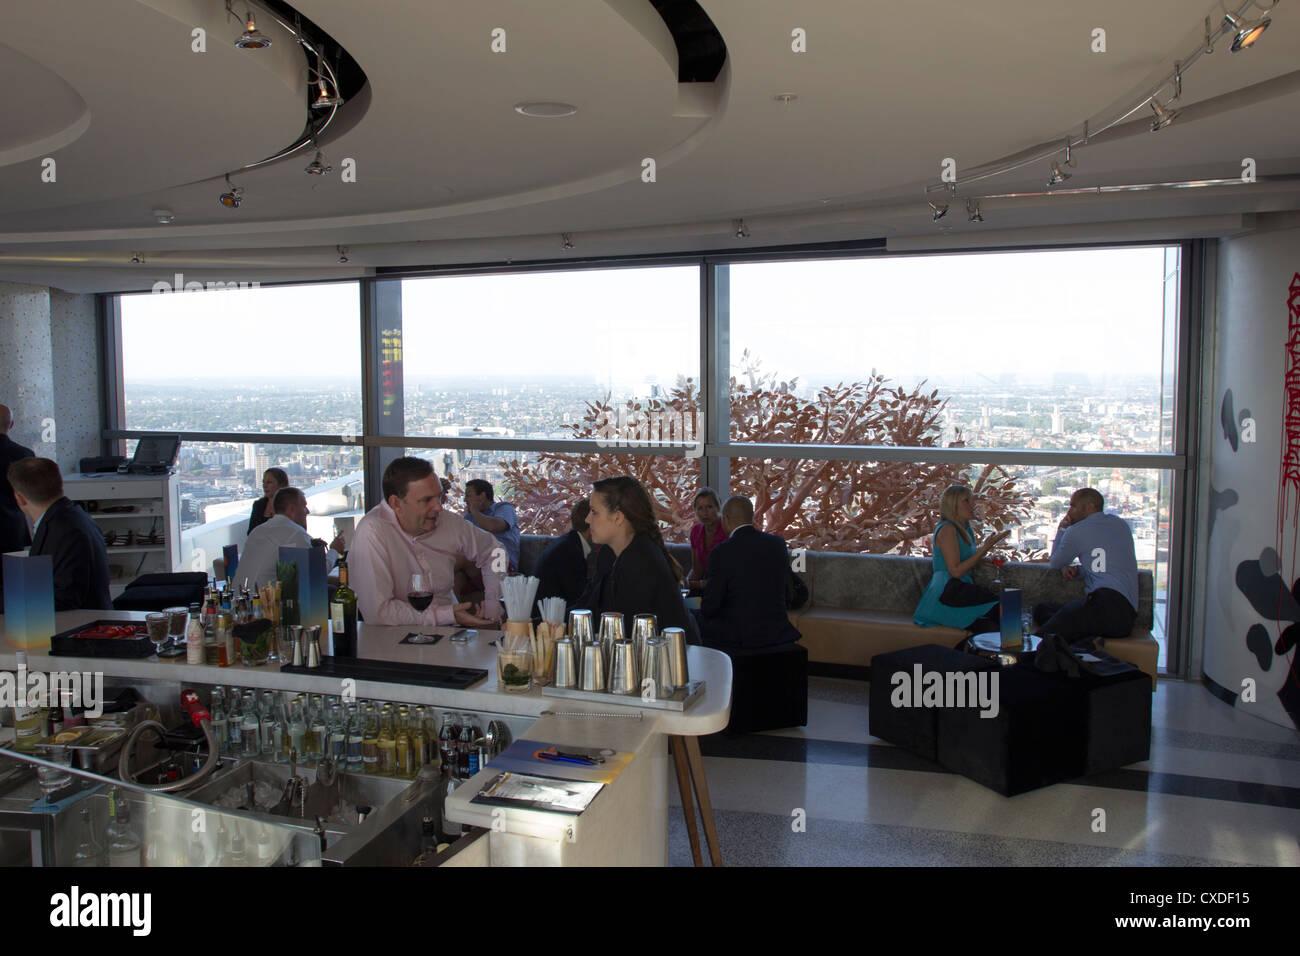 Sky Bar - 39th Floor Heron Tower - City of London - Stock Image